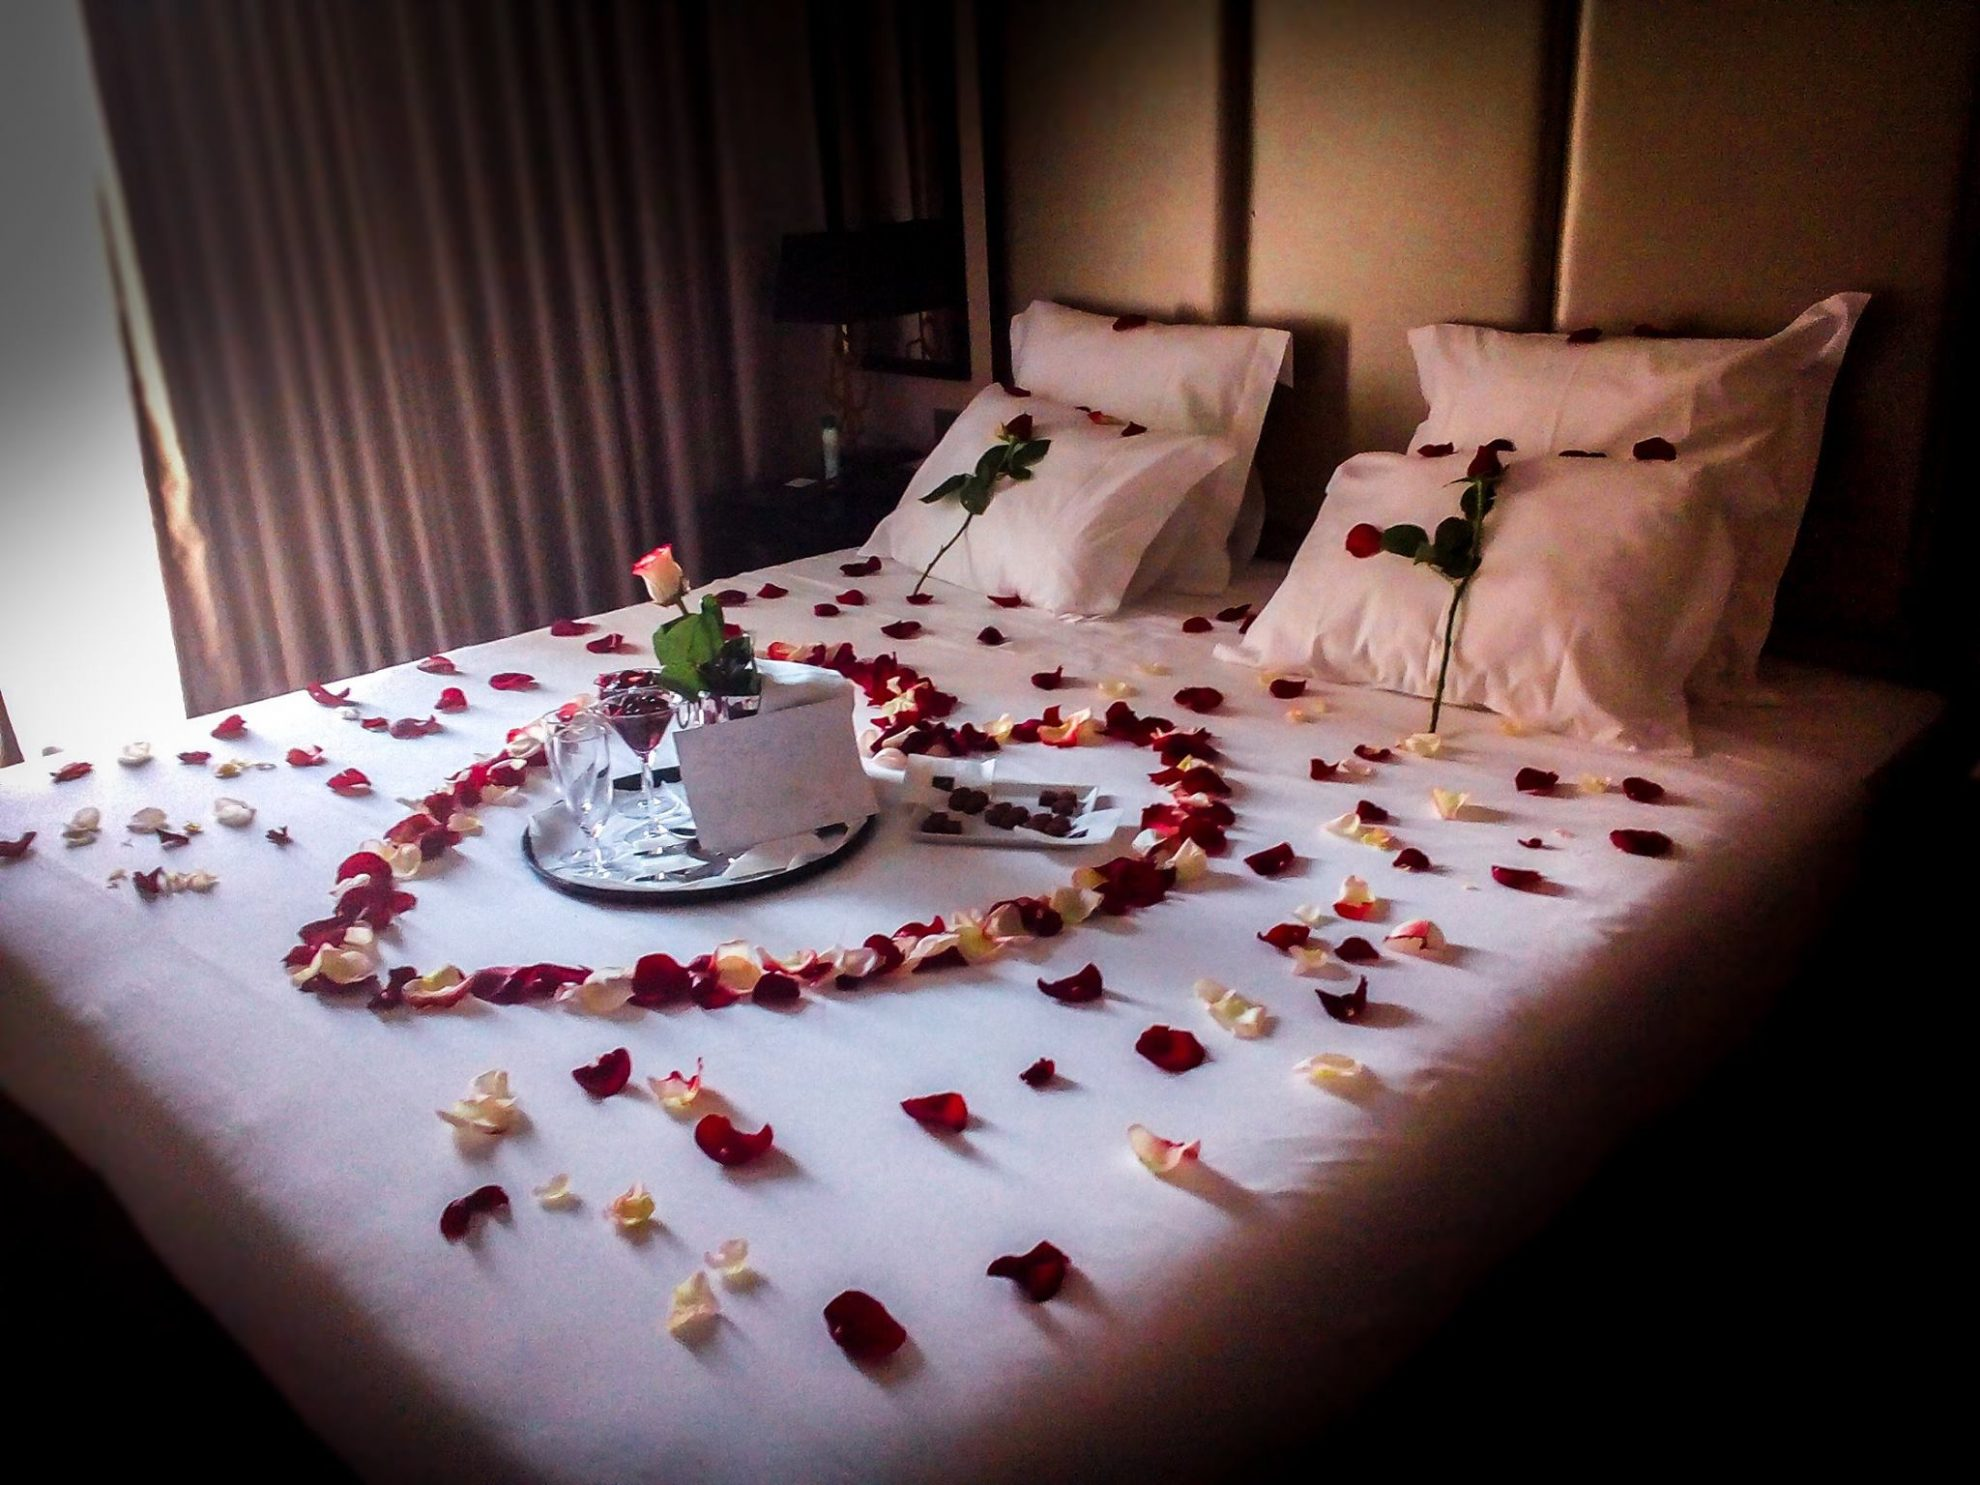 Czar Lisbon Hotel - Chambre decoree - Lisbonne - Week-End et Voyage ...